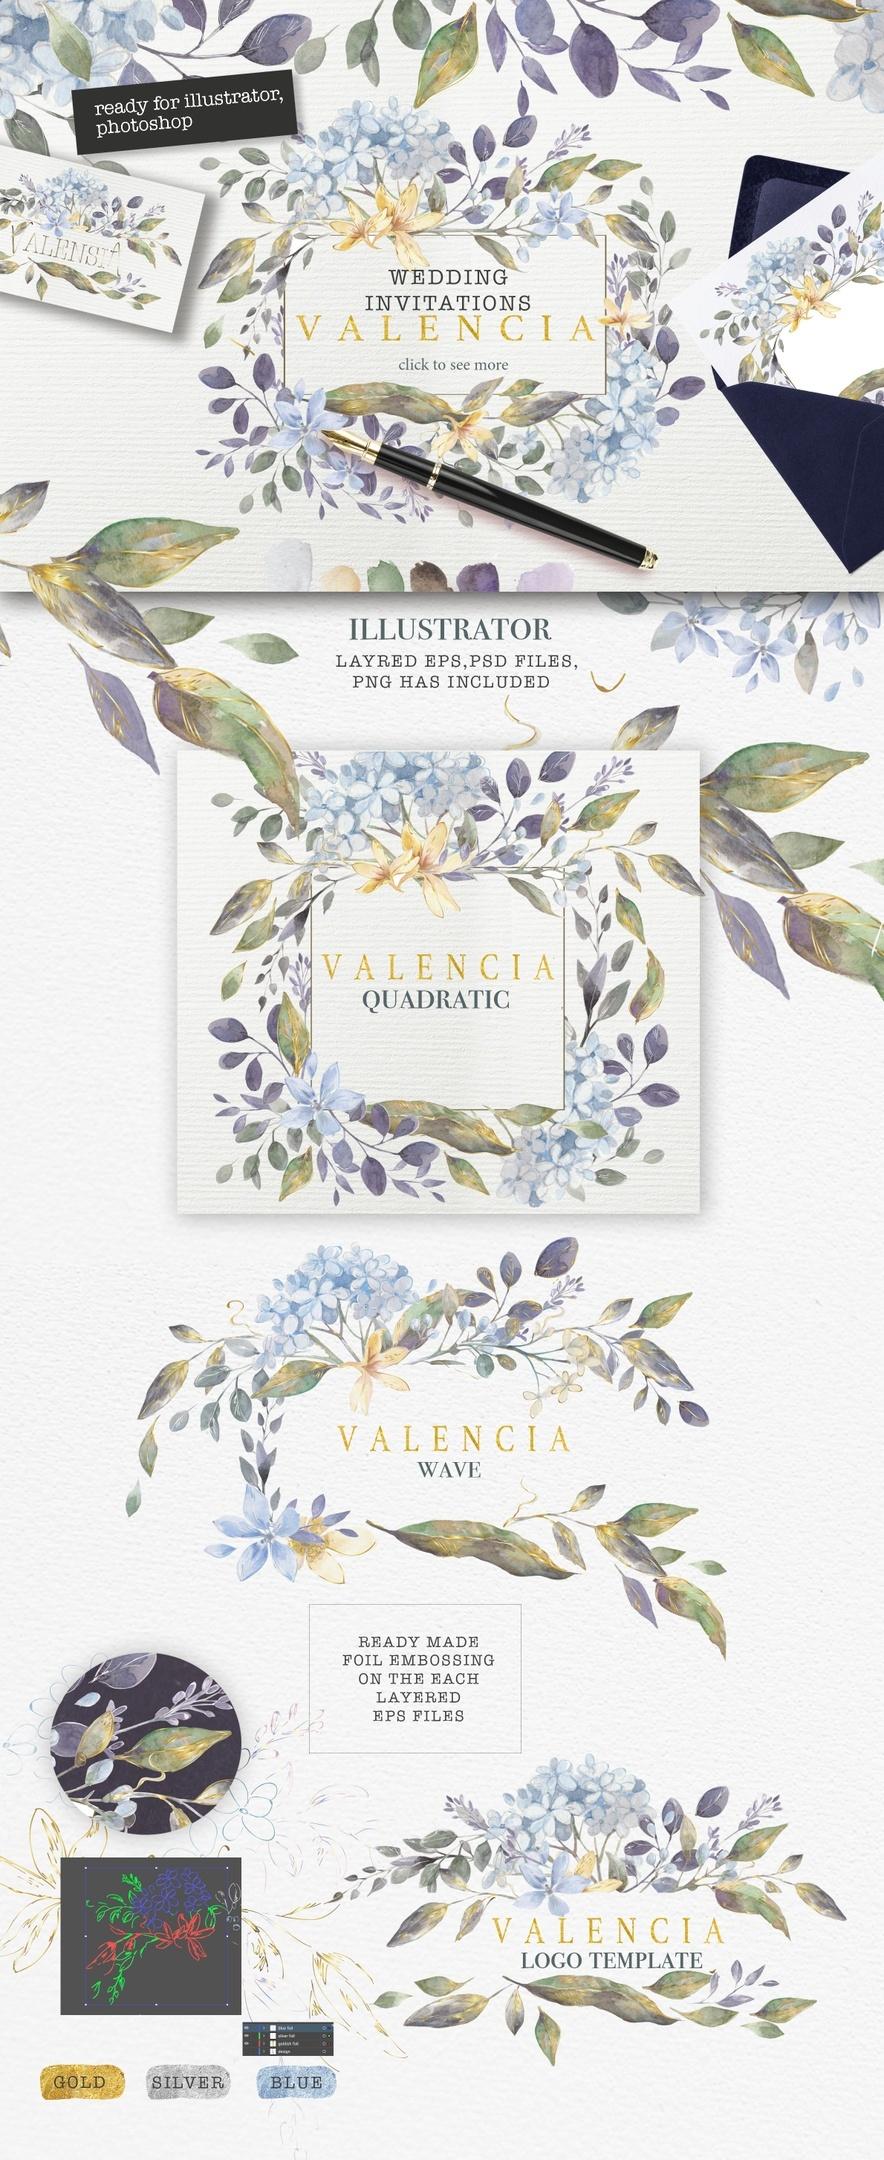 """VALENCIA"" LUXURY WATERCOLOR COLLECTION"